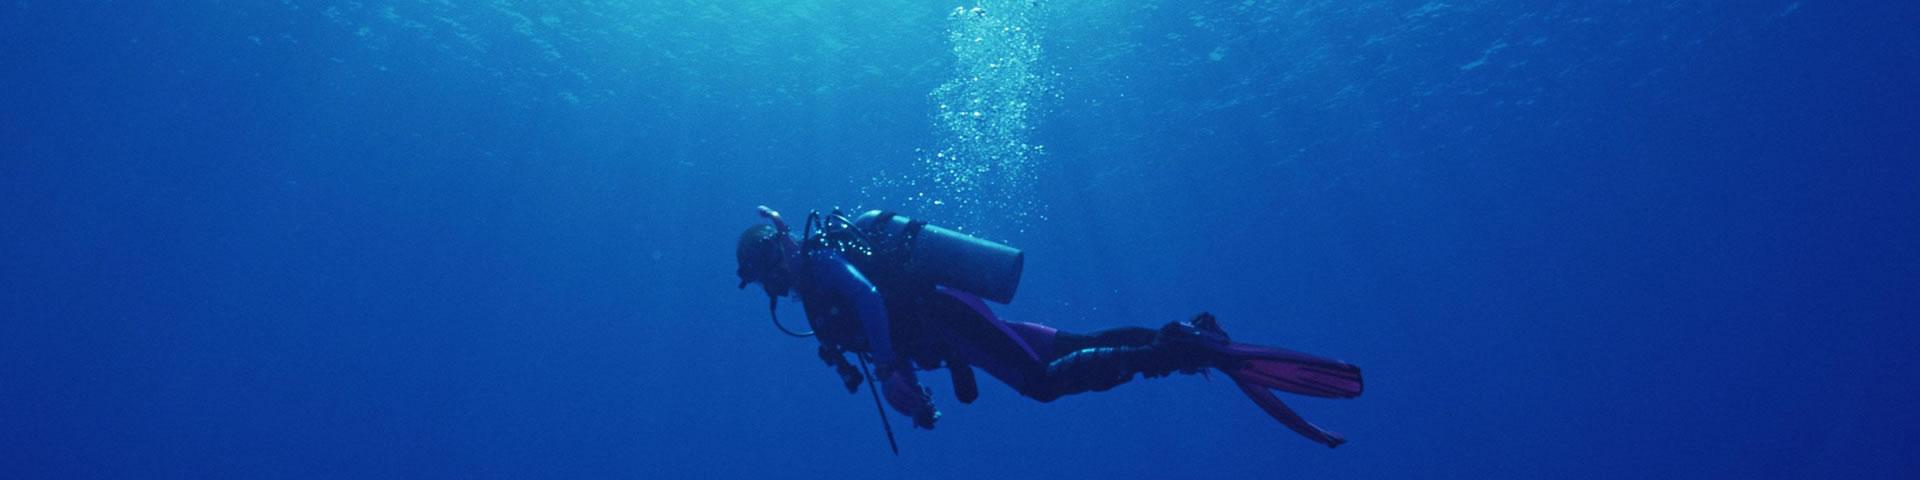 Santorini diving and watersports